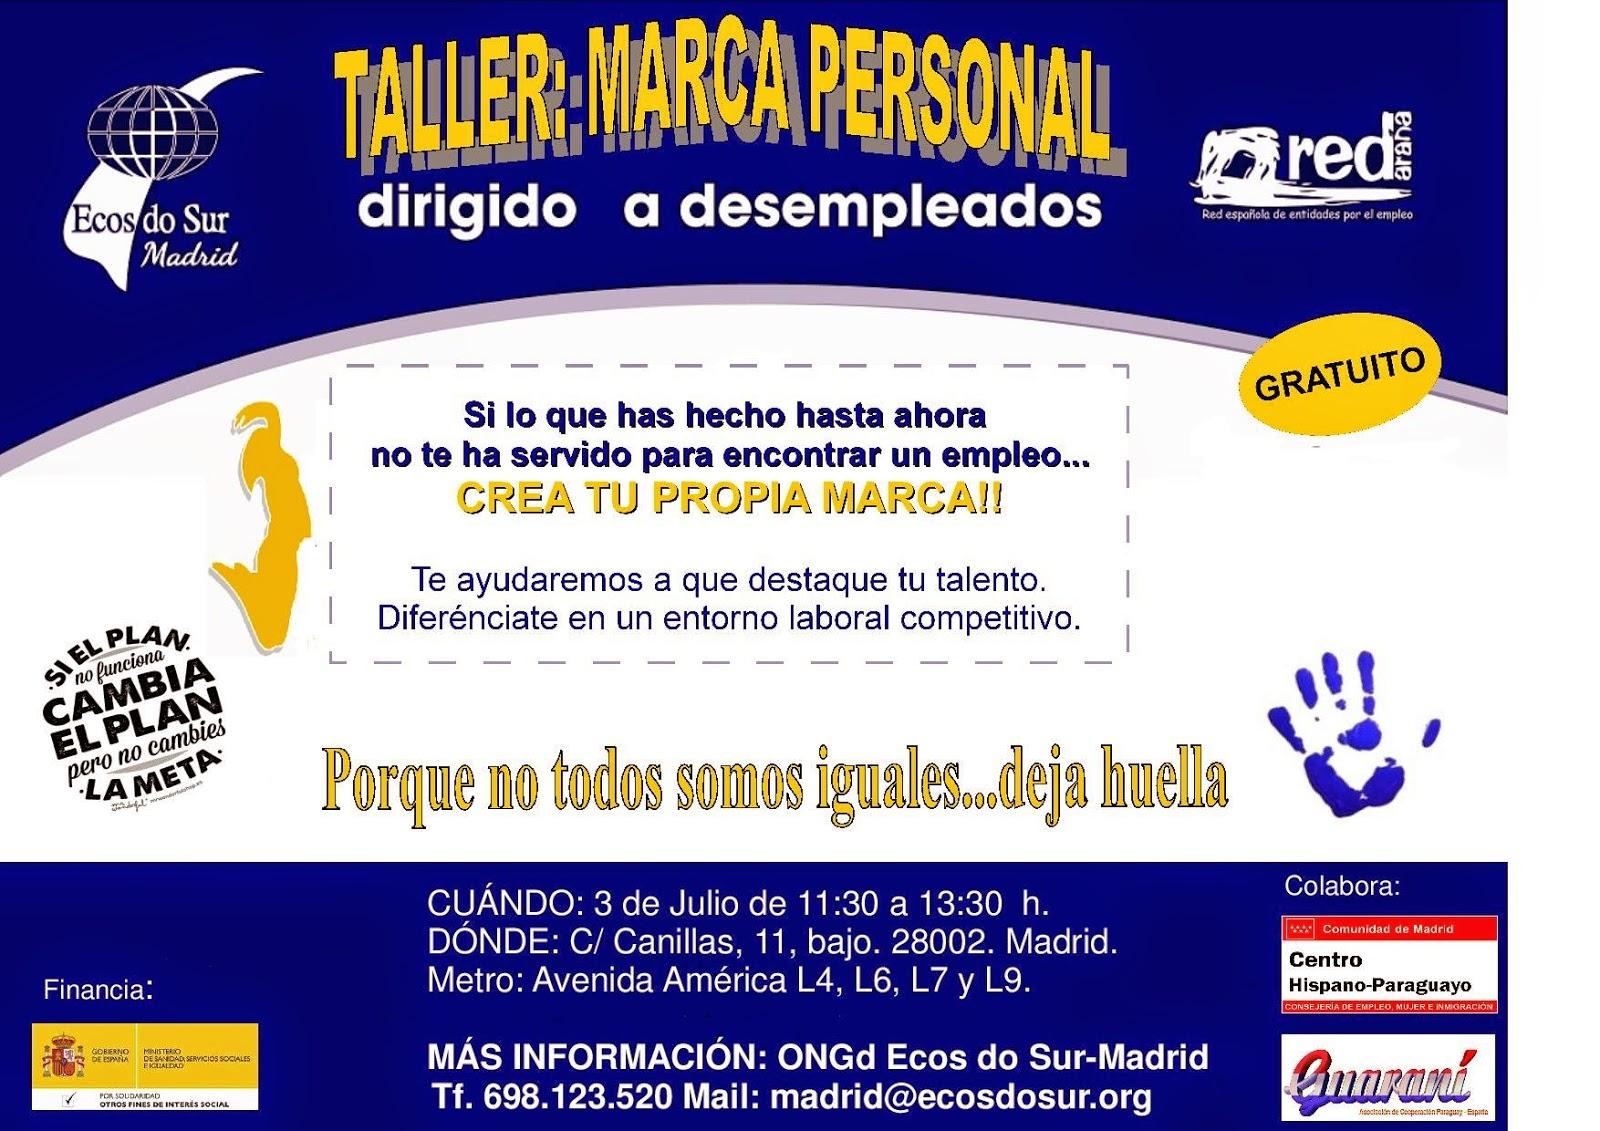 http://www.ecosdosur-madrid.org/noticias/taller-de-marca-personal